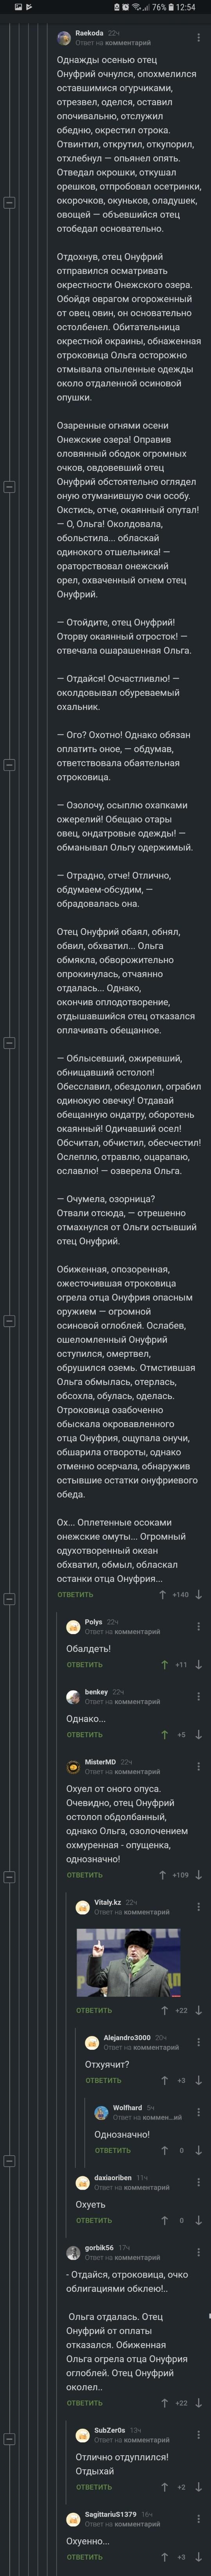 Онуфрий Скриншот, Комментарии на Пикабу, Онуфрий, Длиннопост